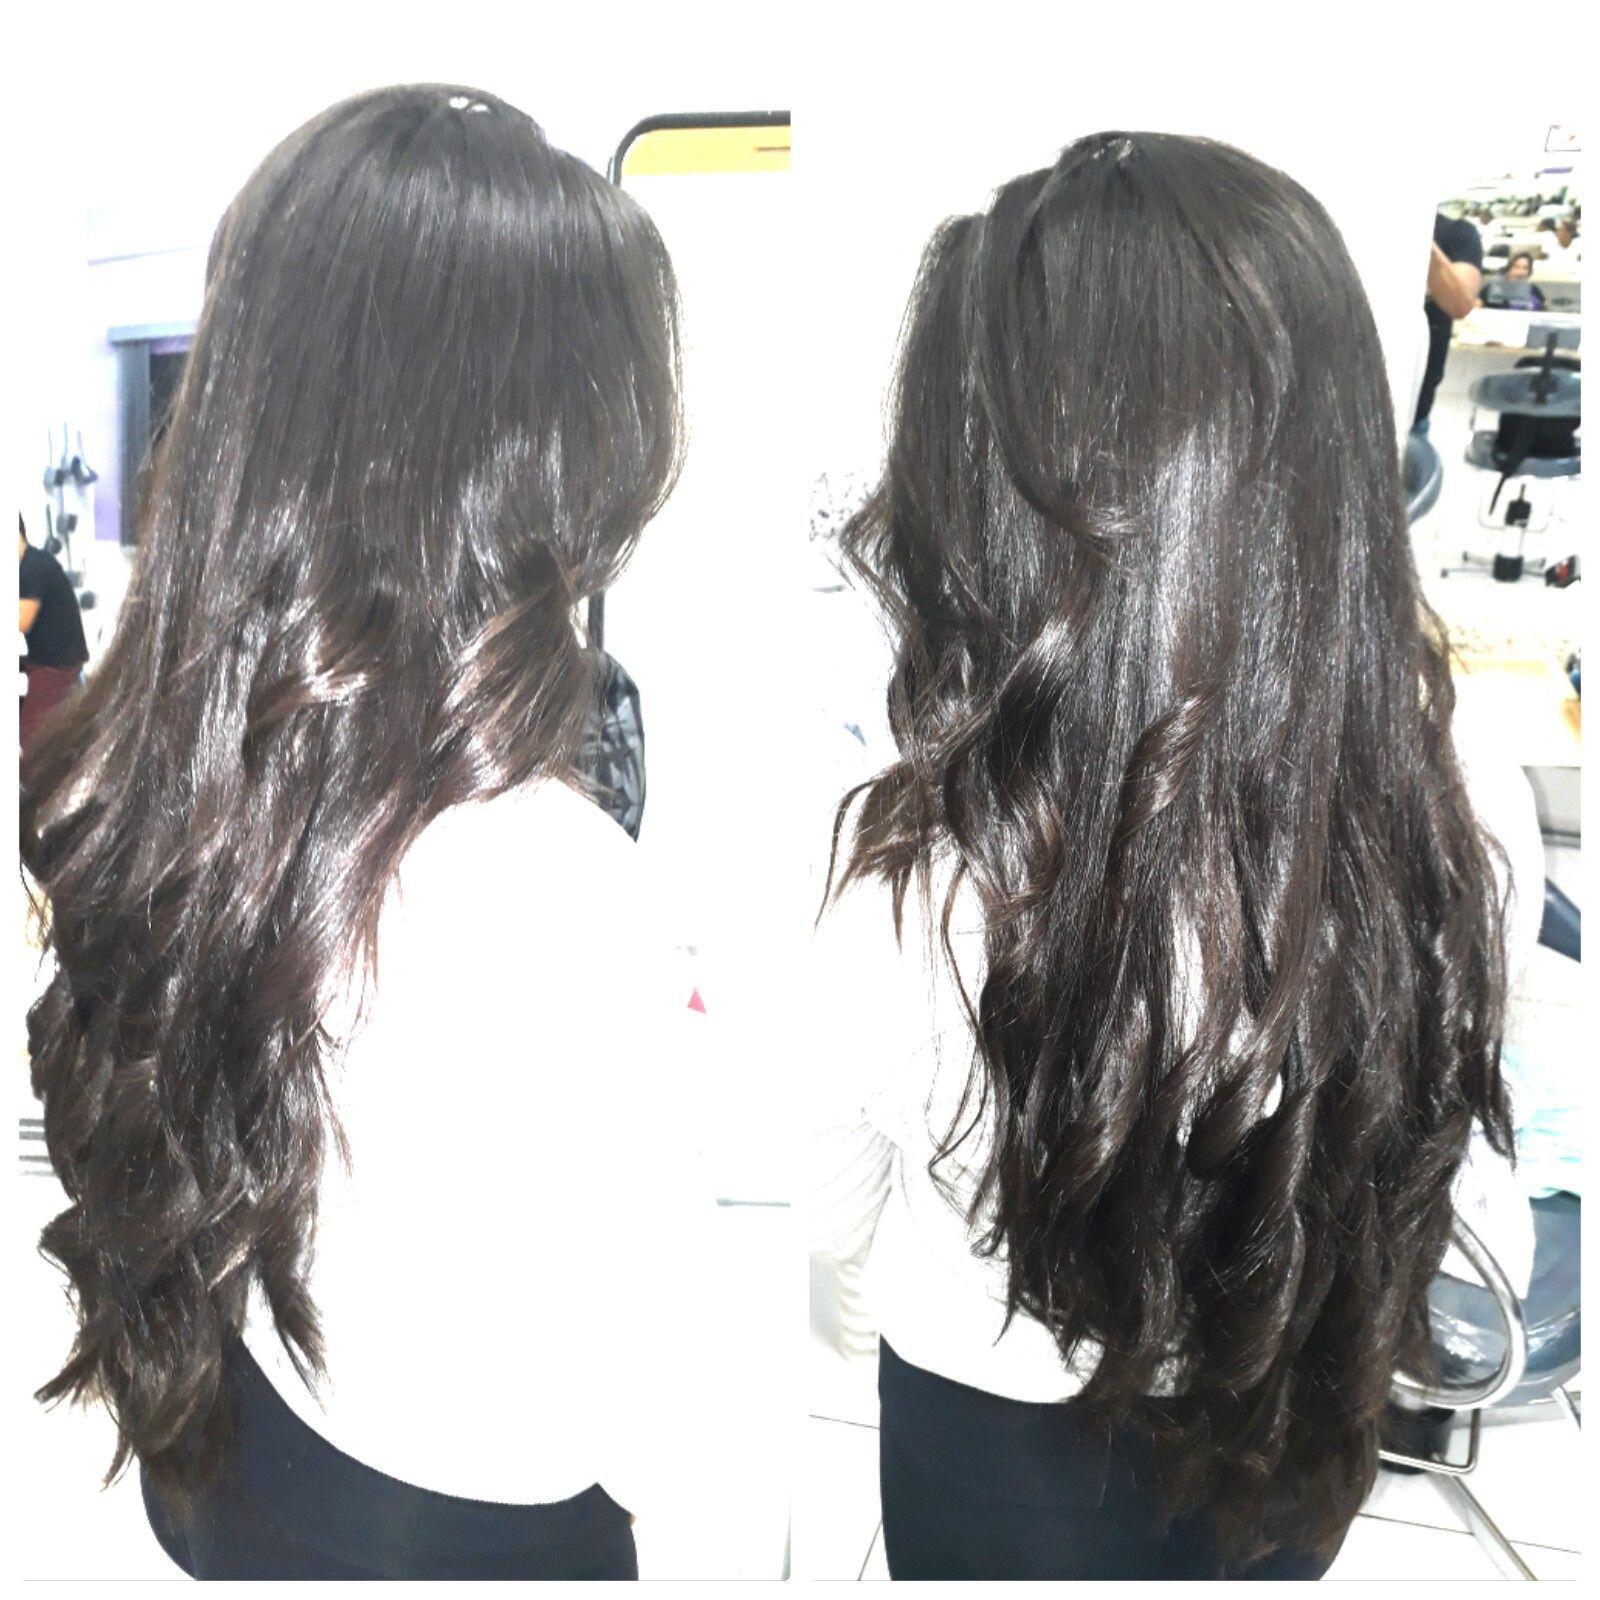 Corte repicado sem tirar comprimento. cabelo auxiliar cabeleireiro(a) auxiliar cabeleireiro(a)